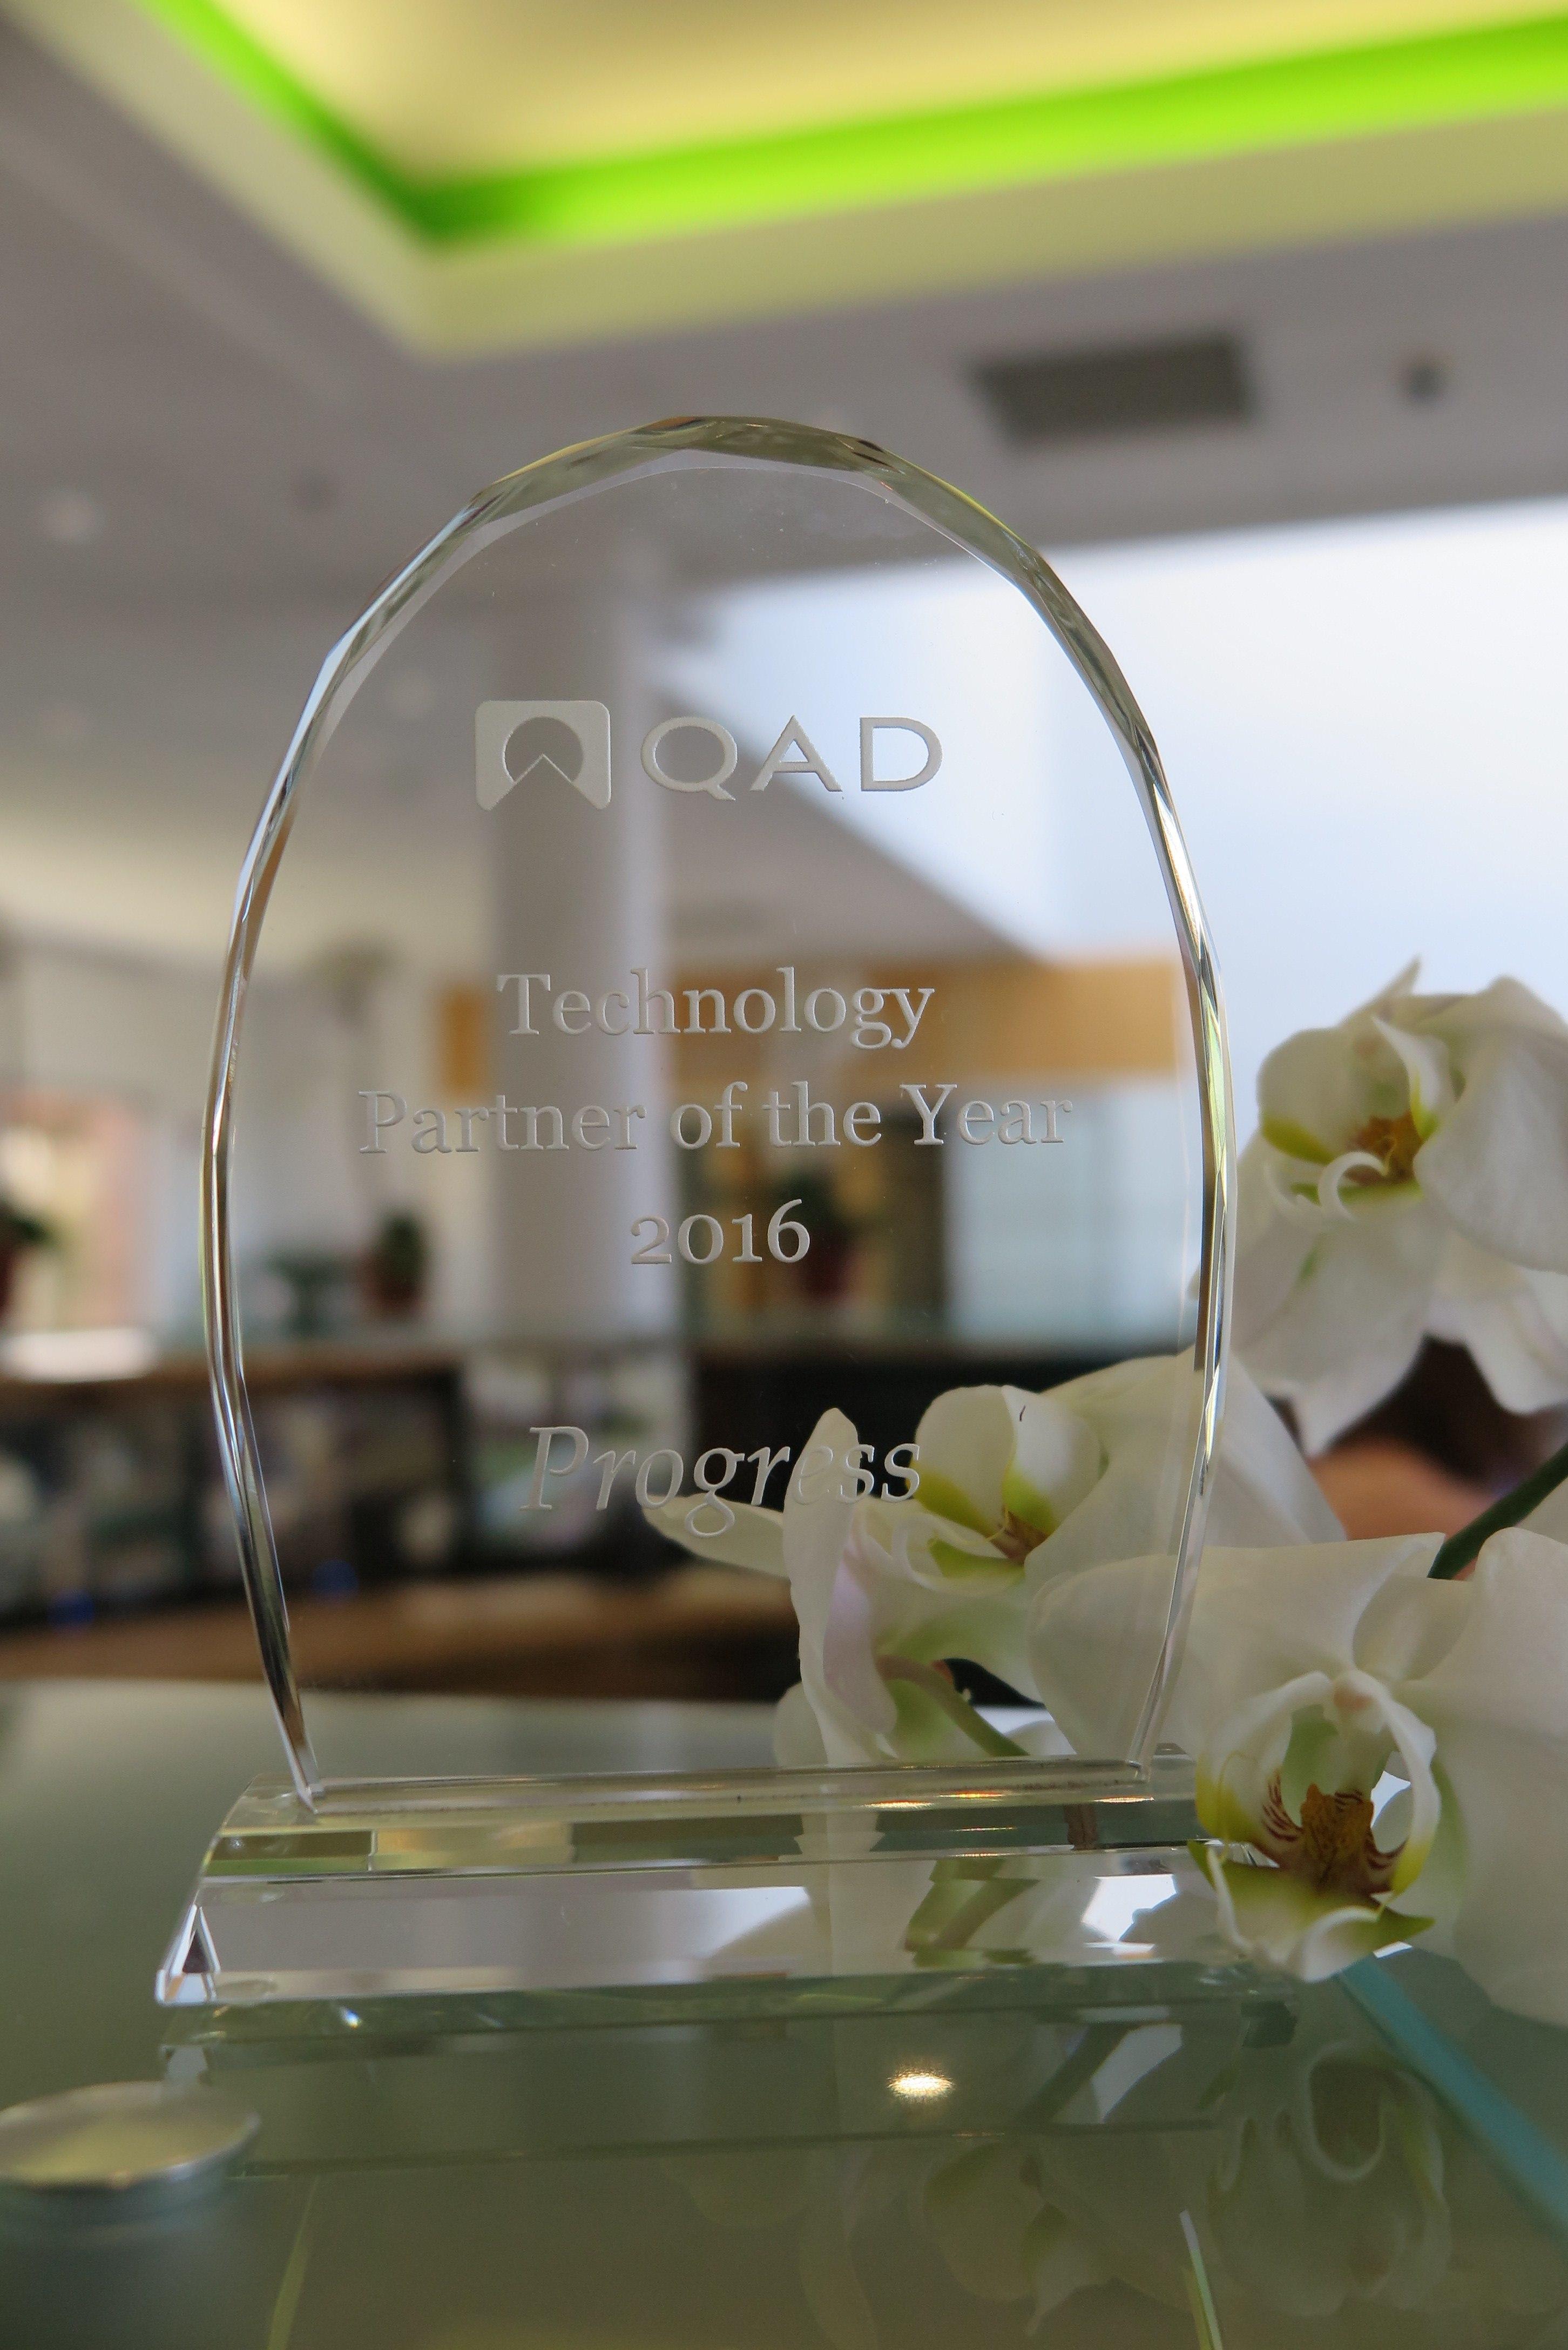 QAD Partner Award 2016